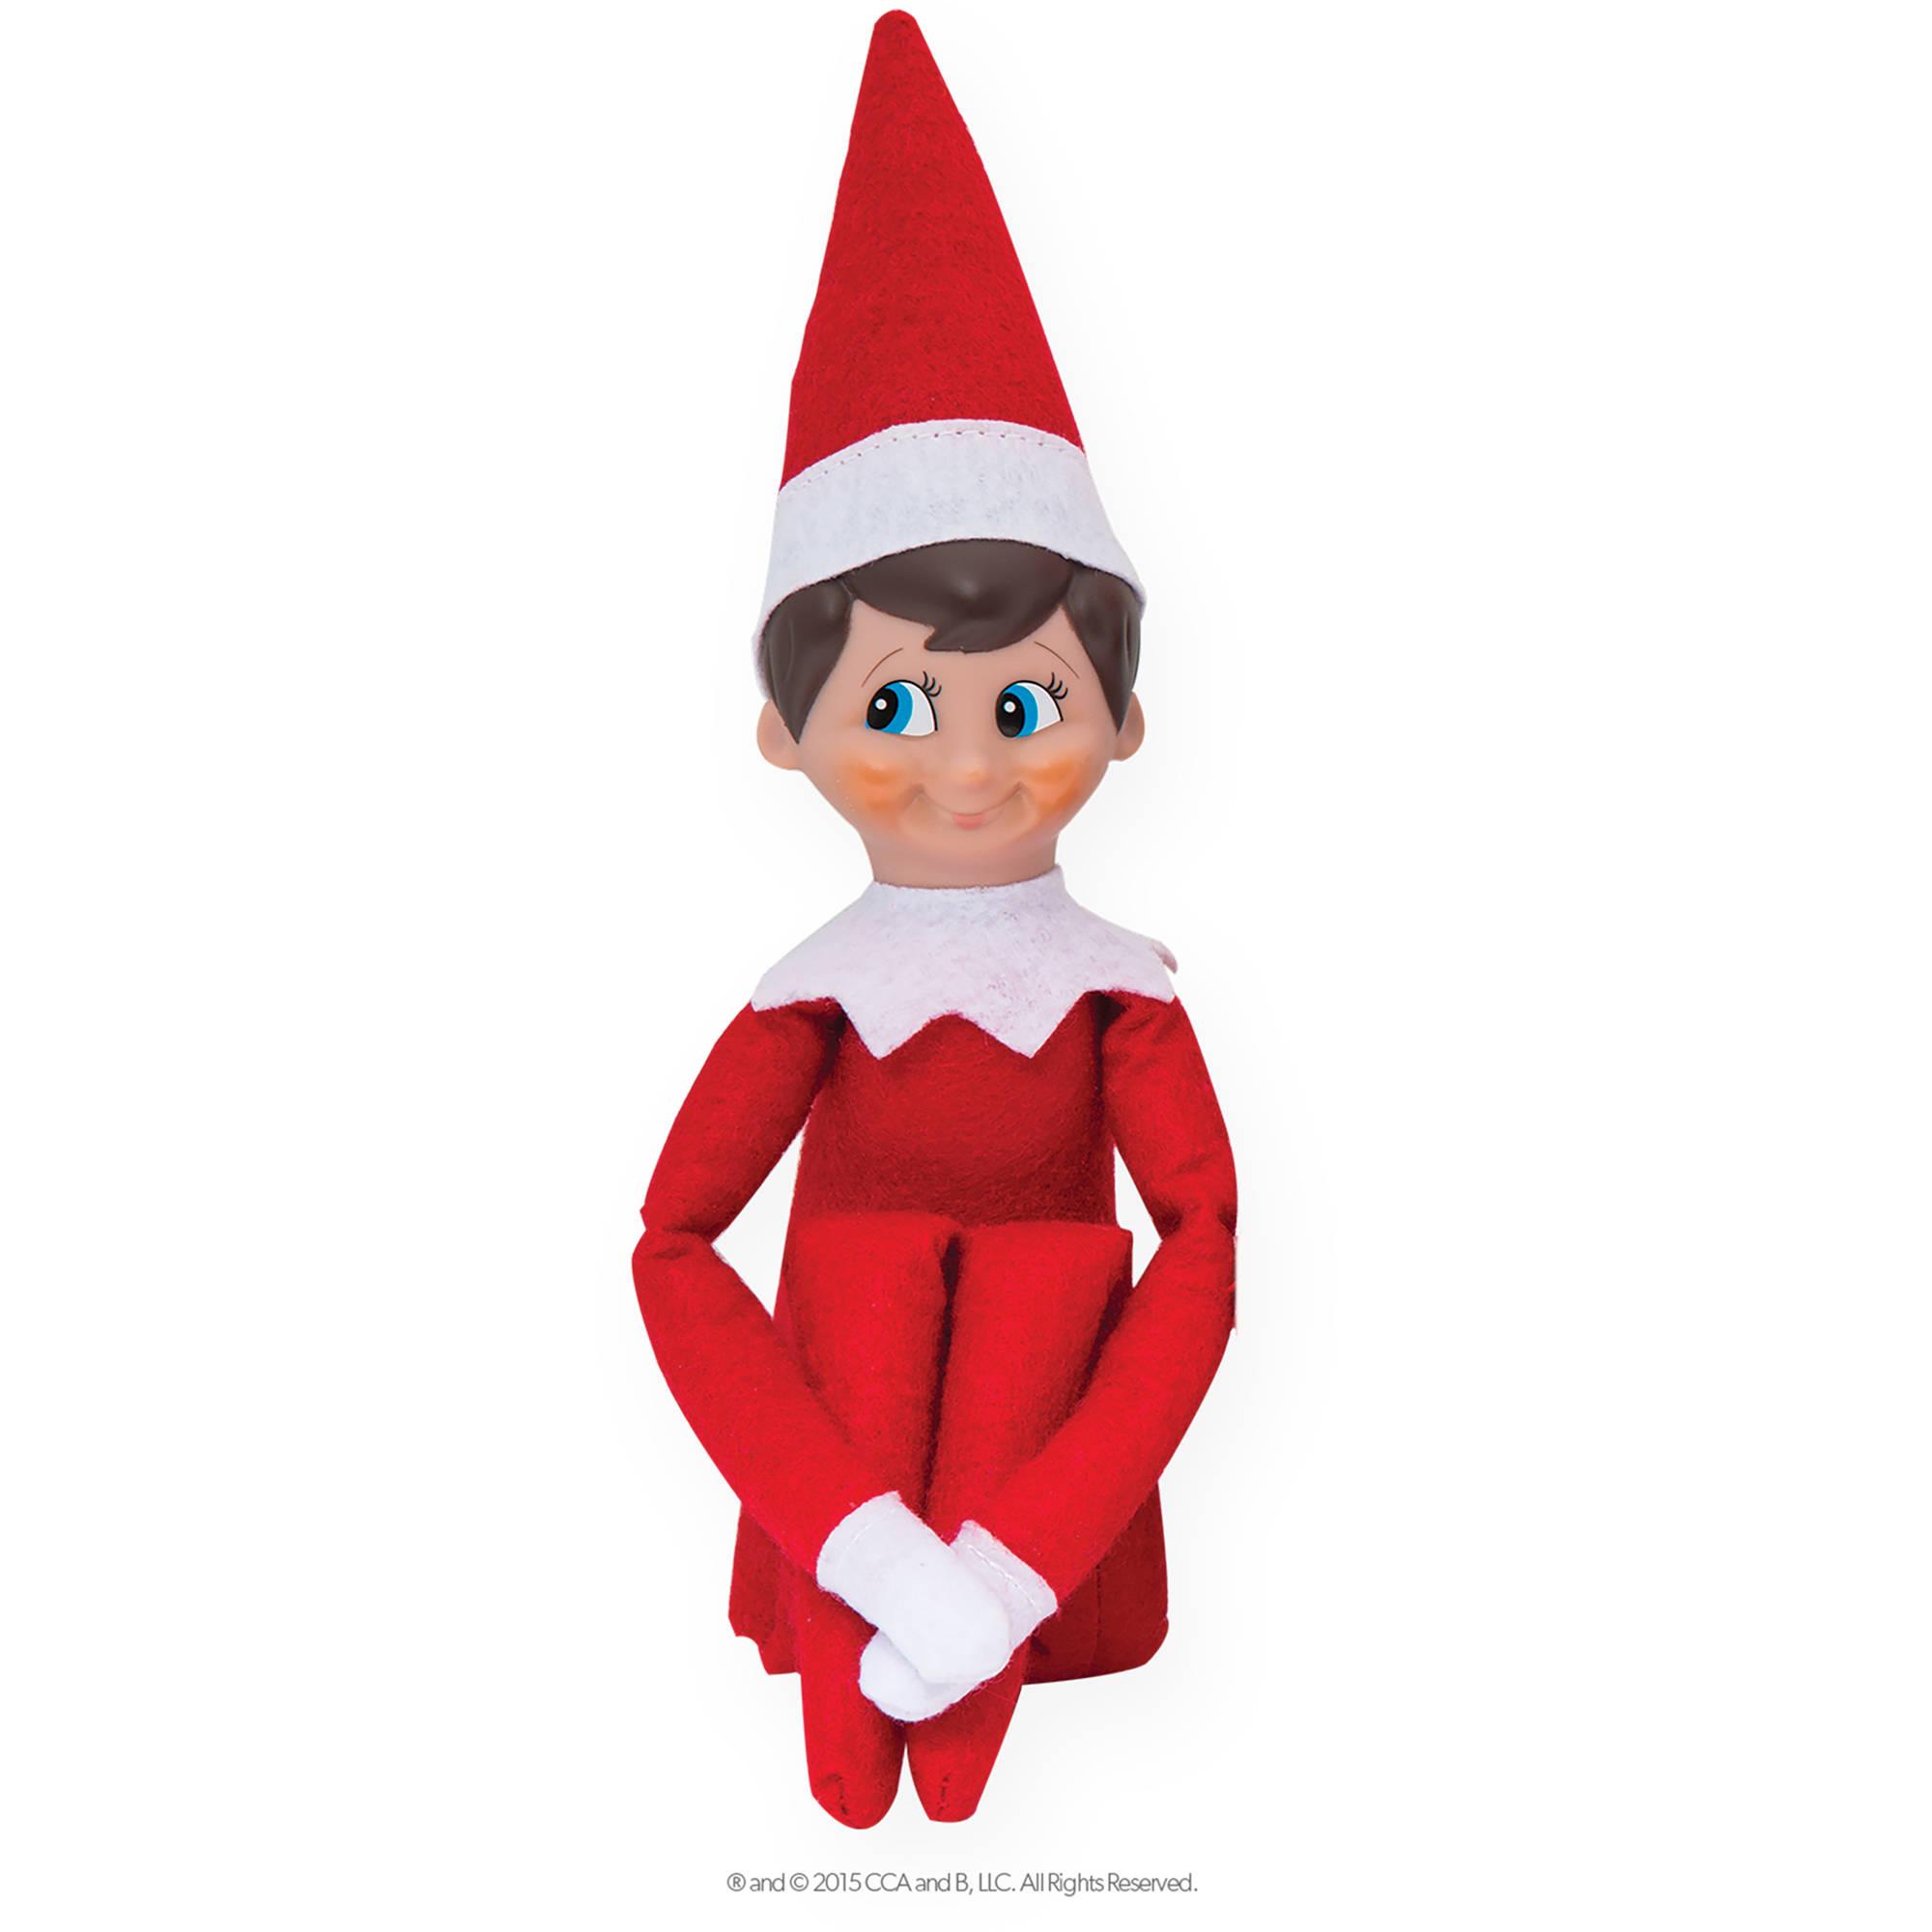 Elf on the shelf boy clipart no hat jpg royalty free stock Elf on the Shelf Boy Light jpg royalty free stock